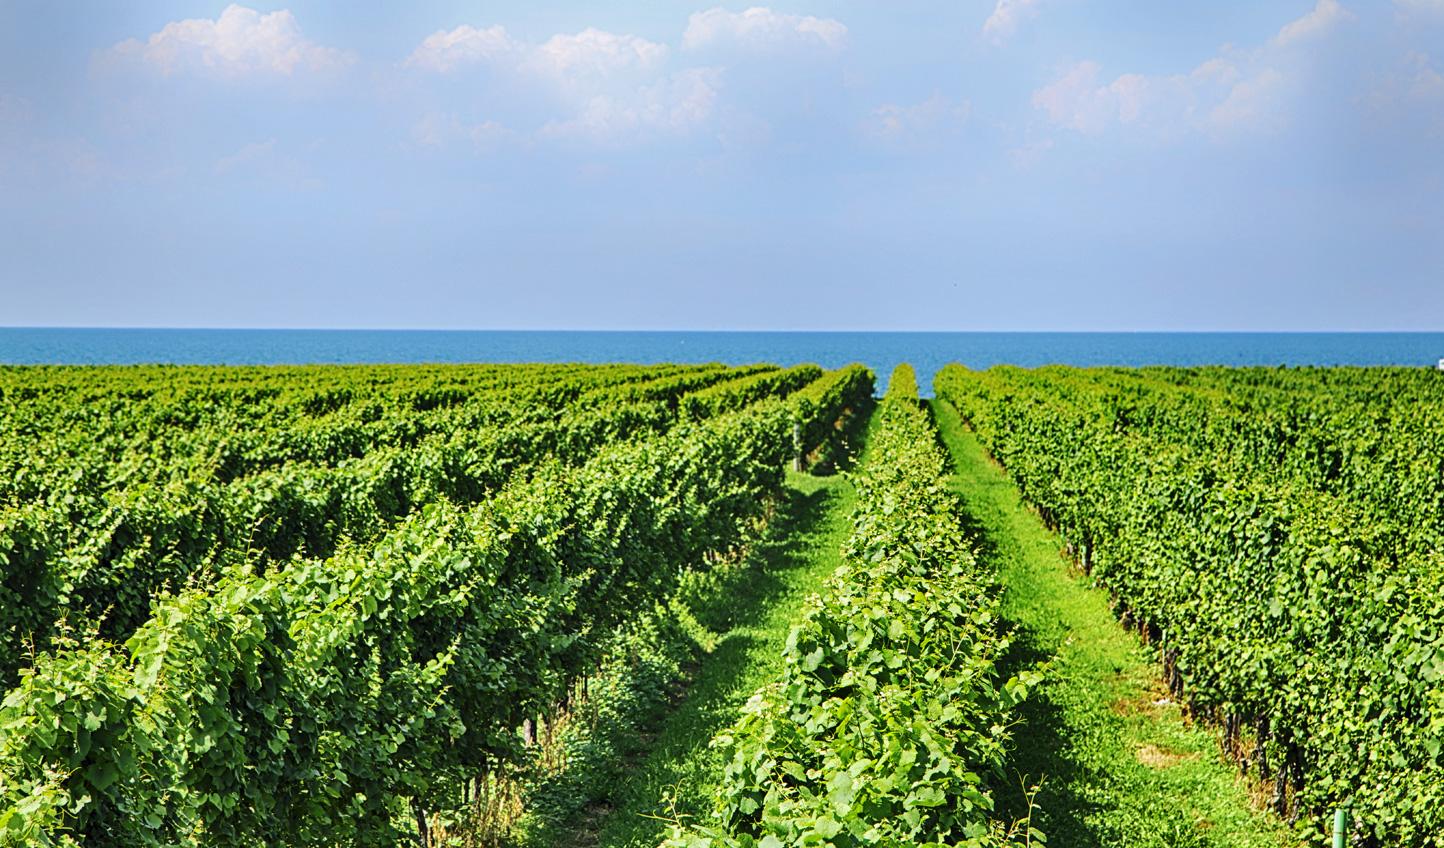 A charming vineyard in Niagara